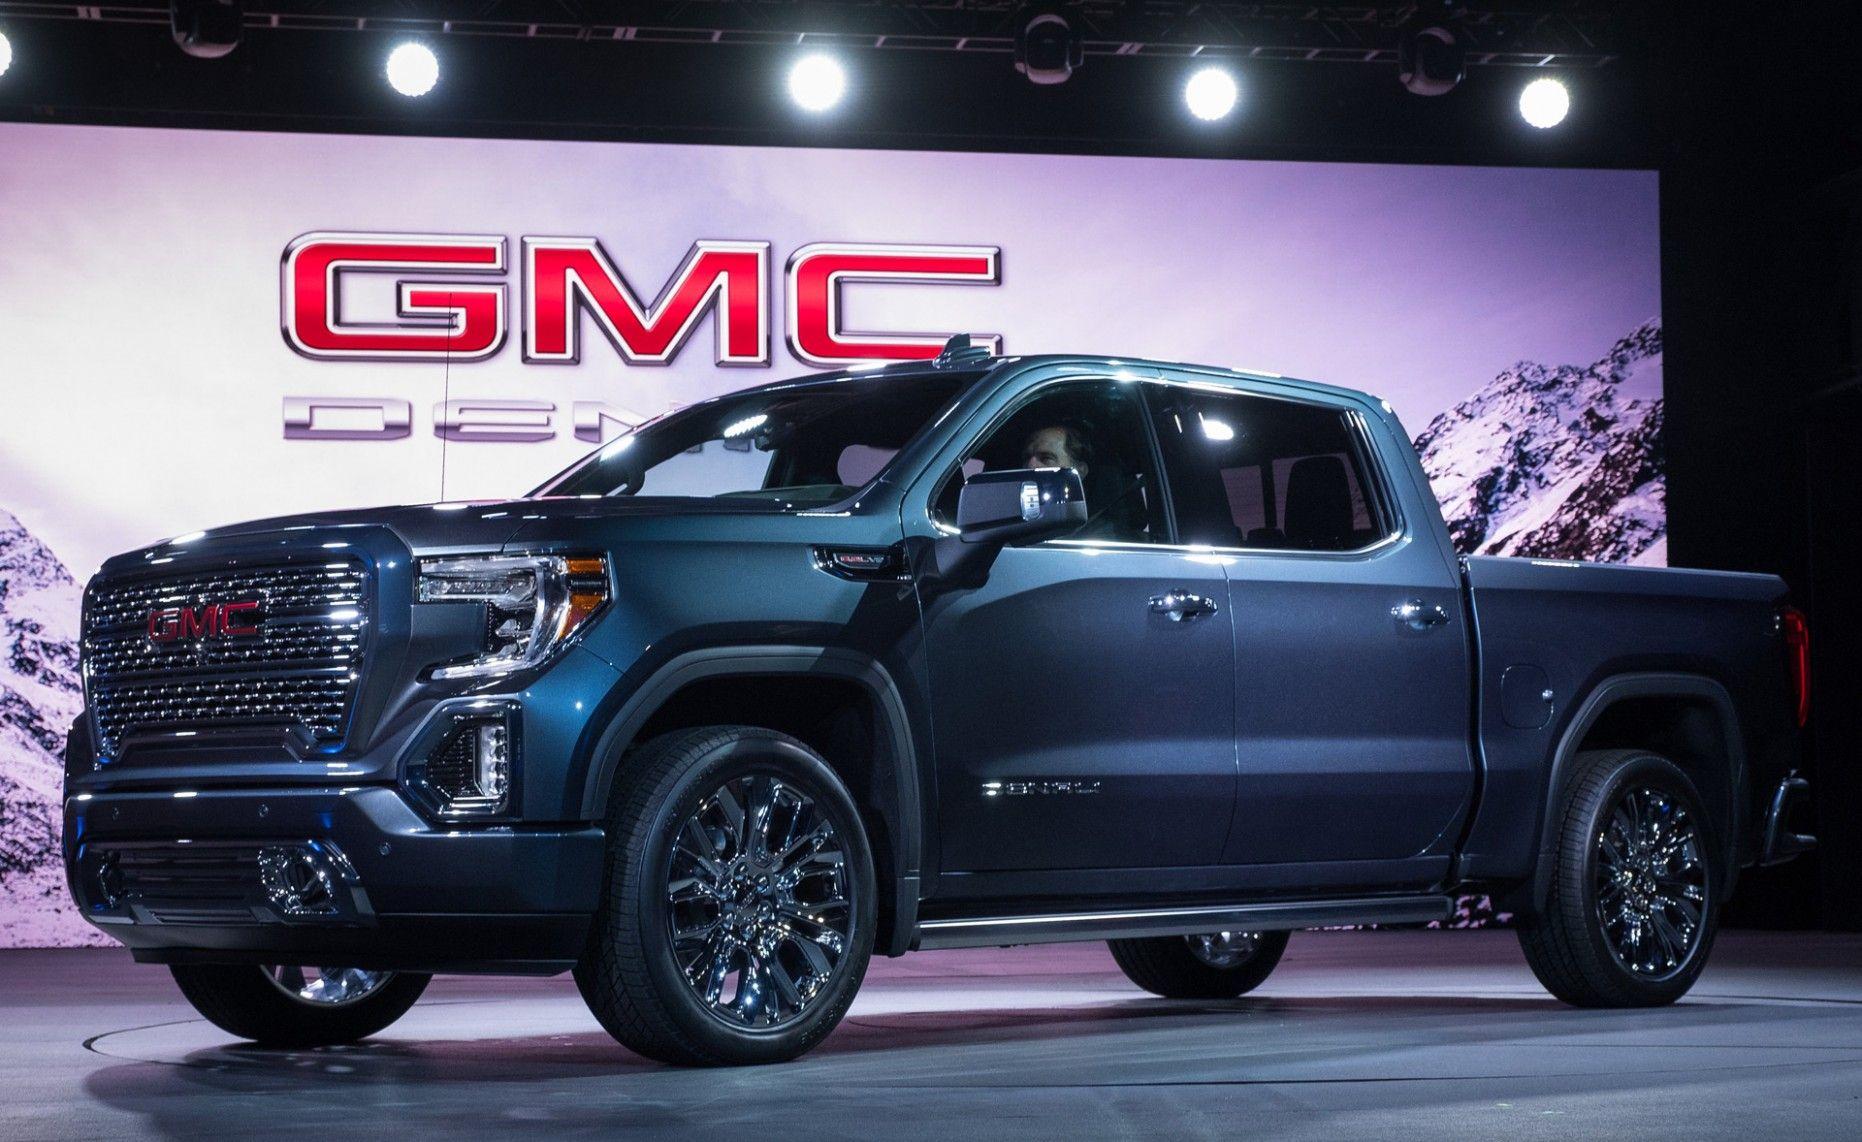 Gmc Pickup 2020 Price Engine In 2020 Gmc Trucks Gmc Sierra Denali Gmc Denali